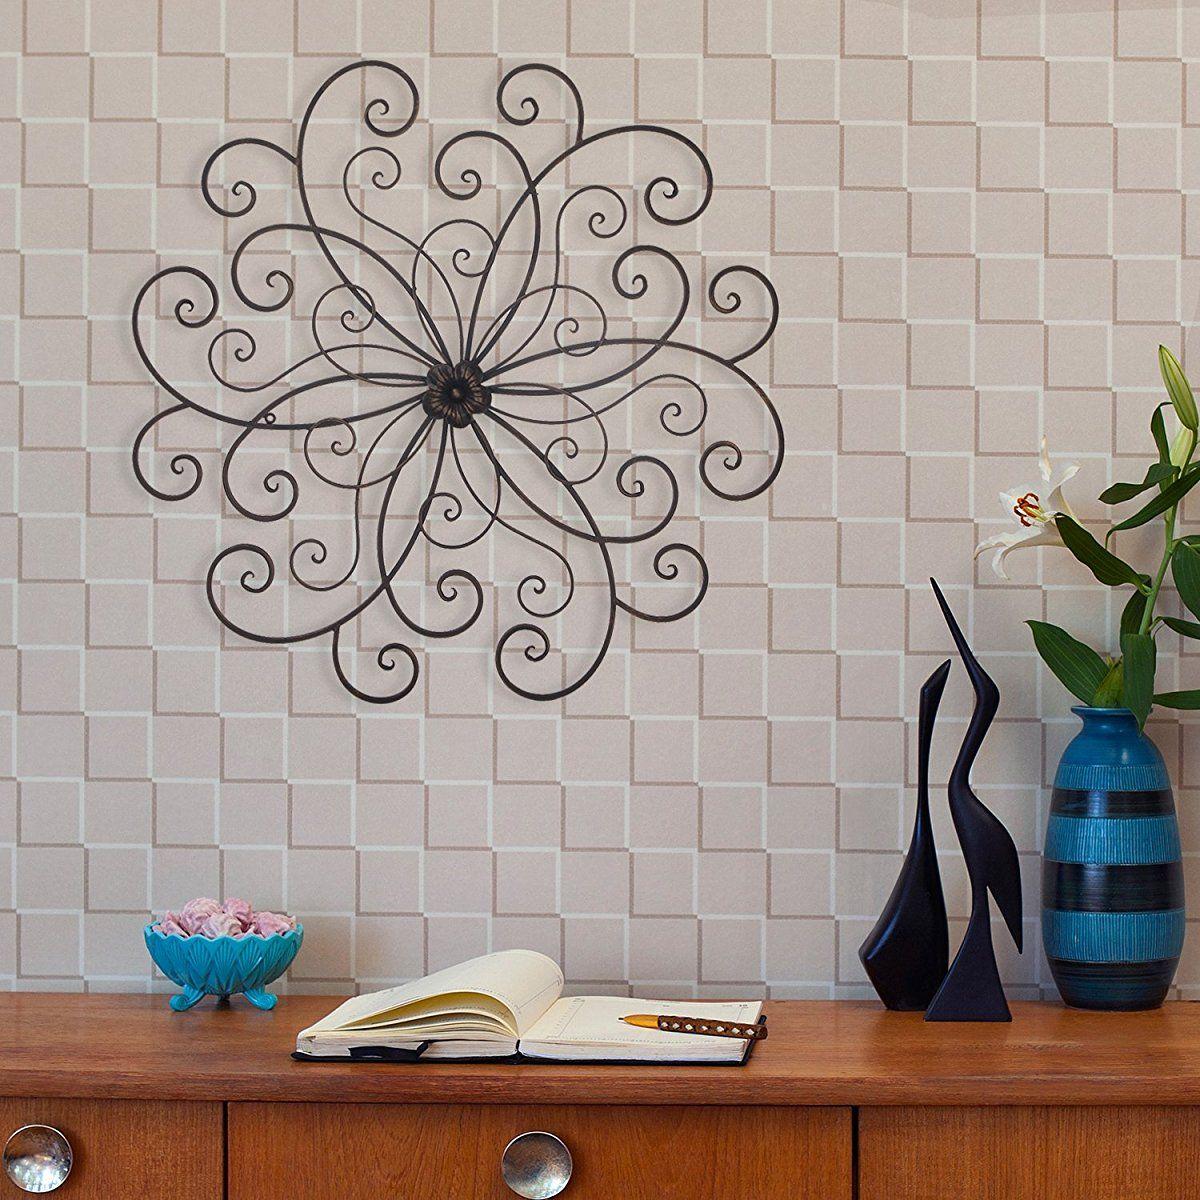 Kitchen Metal Wall Decor: Homes Art Bronze Flower Urban Design Metal Wall Decor For